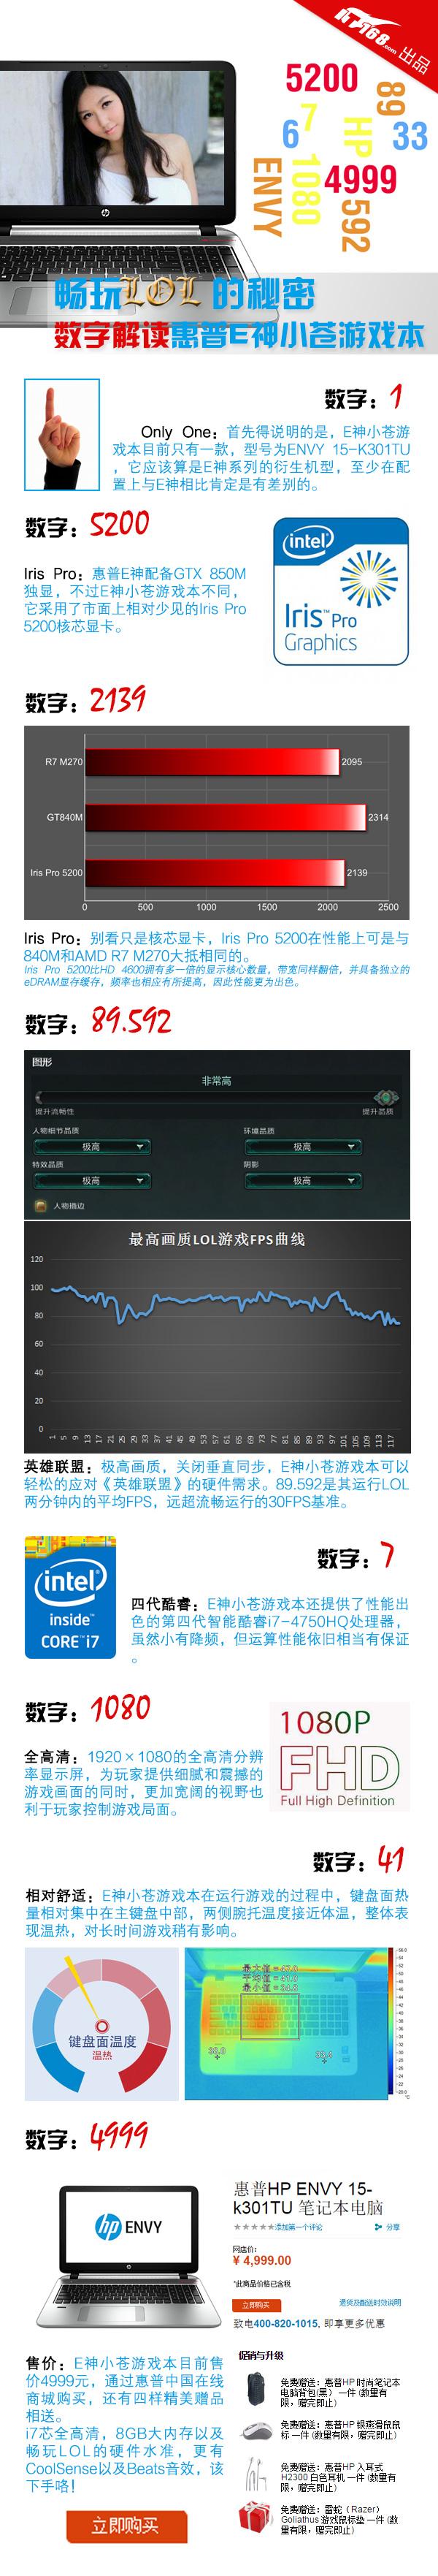 i7芯+锐炬显卡 数读惠普E神小苍游戏本